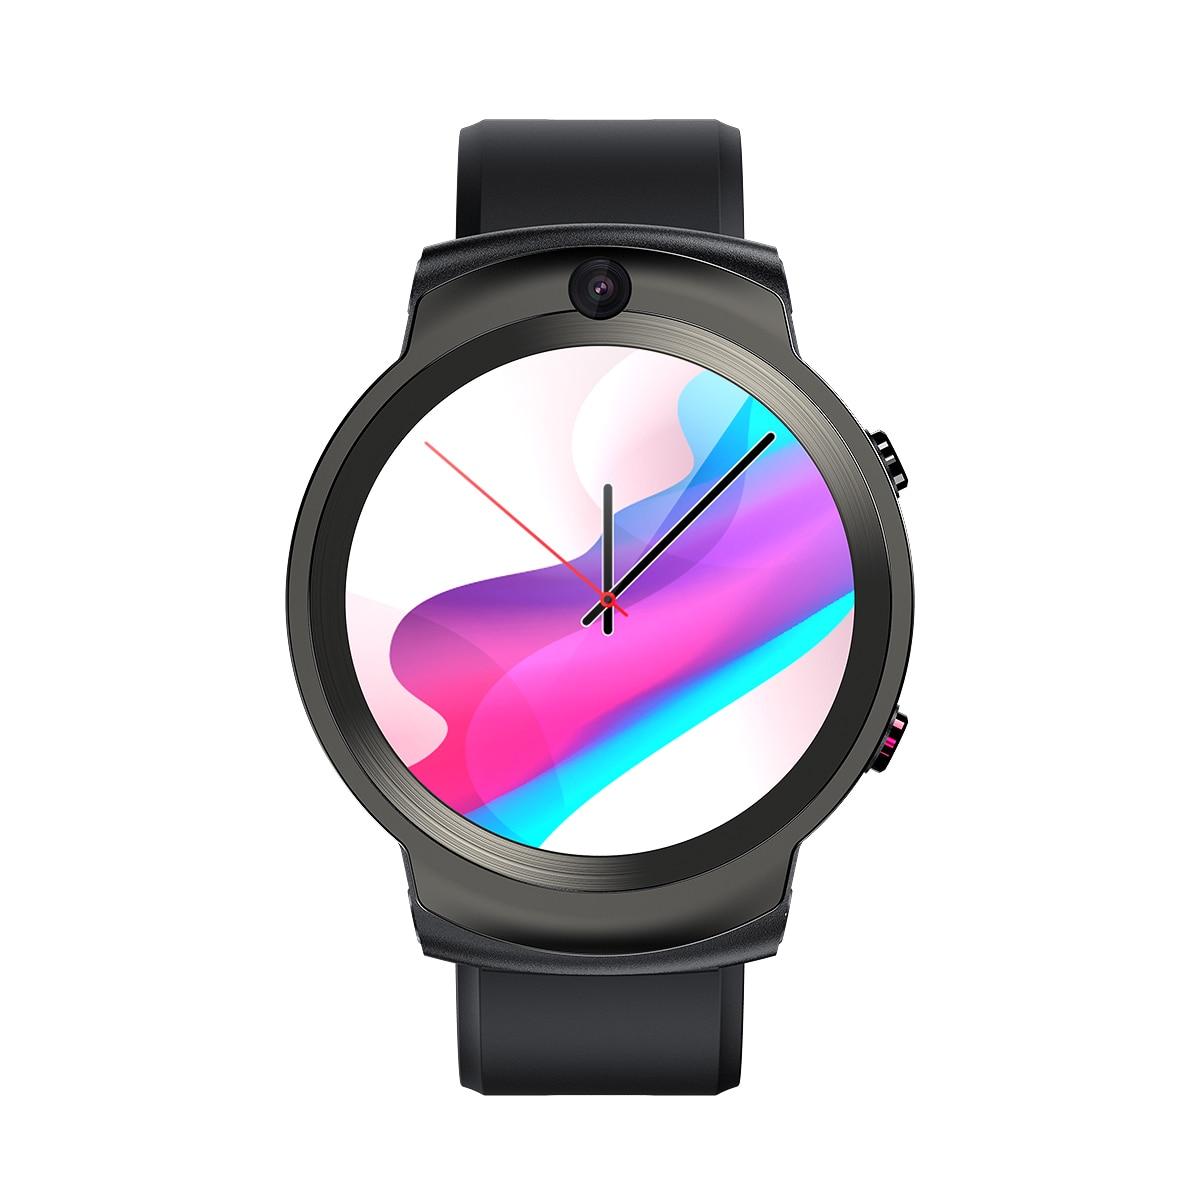 Get DM28 4G 1.6 Inch Screen Smart Watch Android 7.1 OS 3GB 32GB 8MP Camera 400*400 Resolution 1280mah Battery Smartwatch Men Women